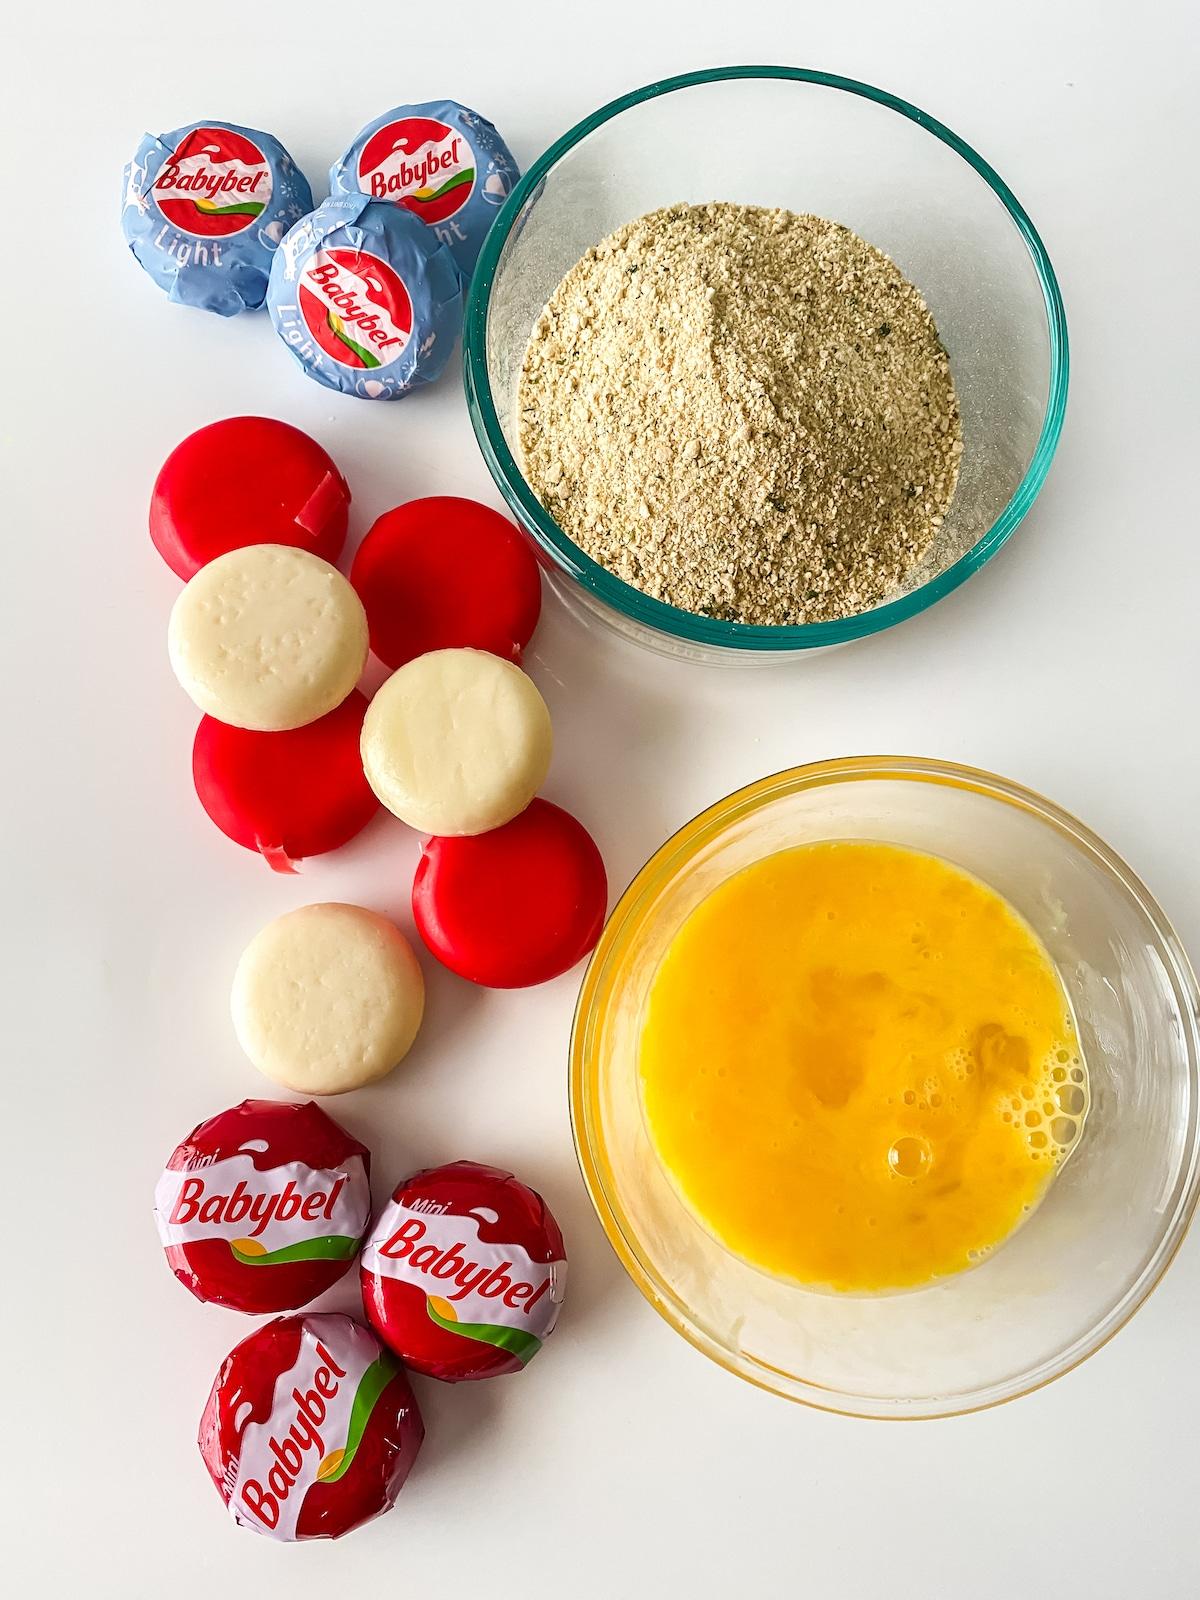 Ingredients for air fryer baby bel cheese bites